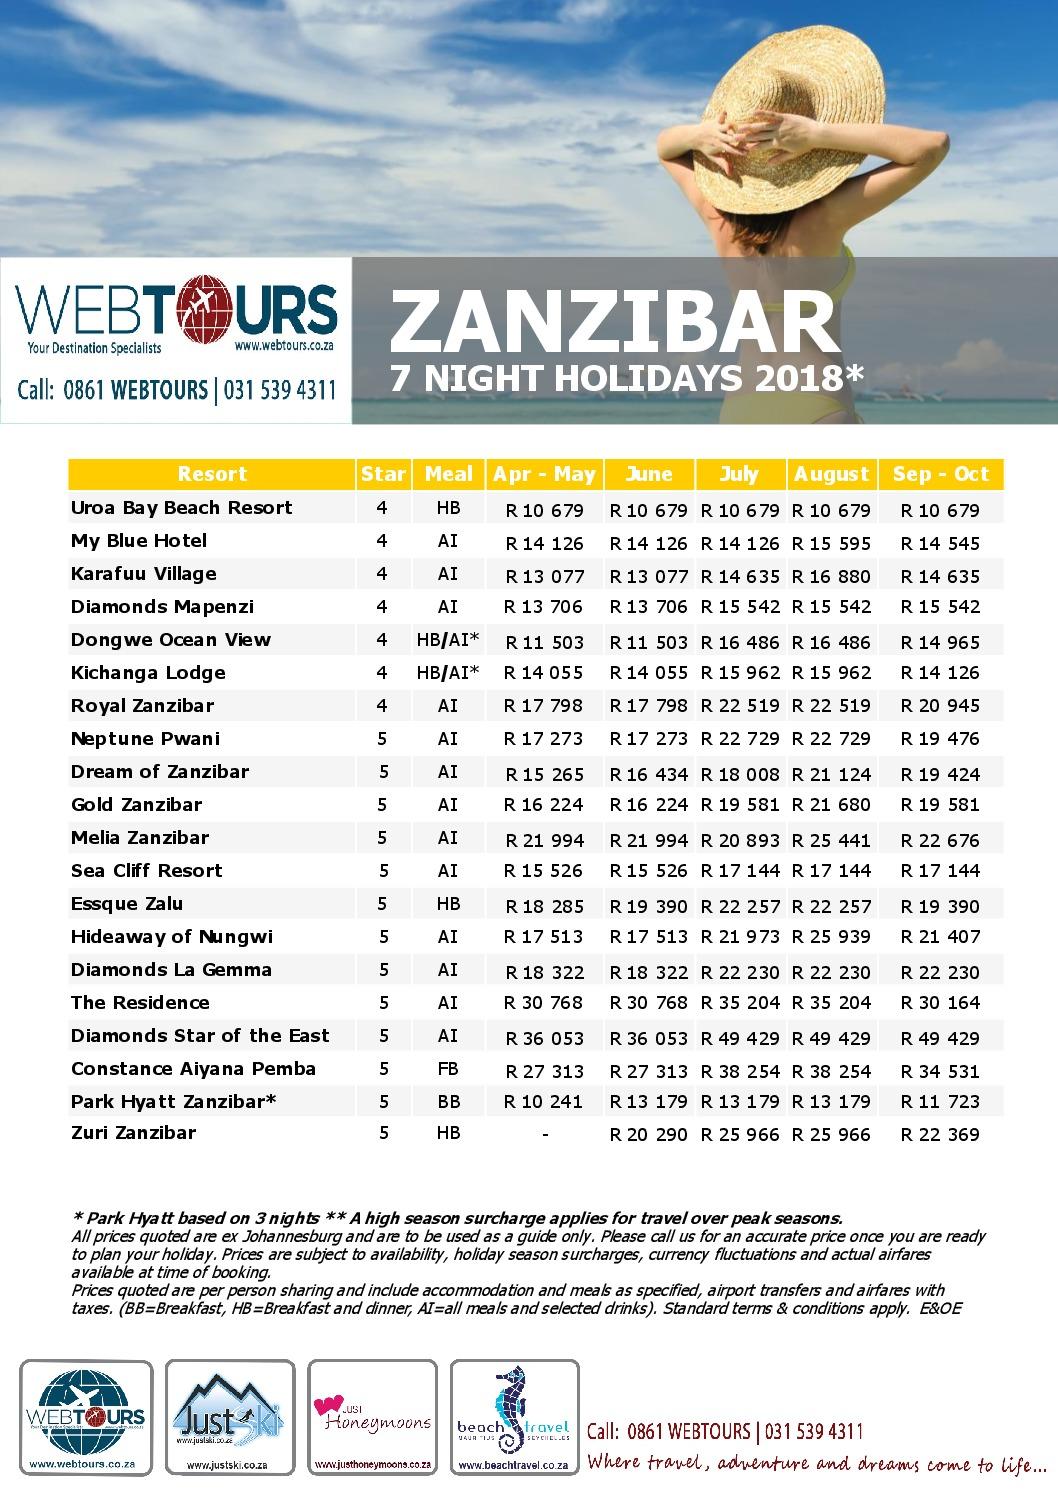 7 Nights Zanzibar, Valid until Oct '18